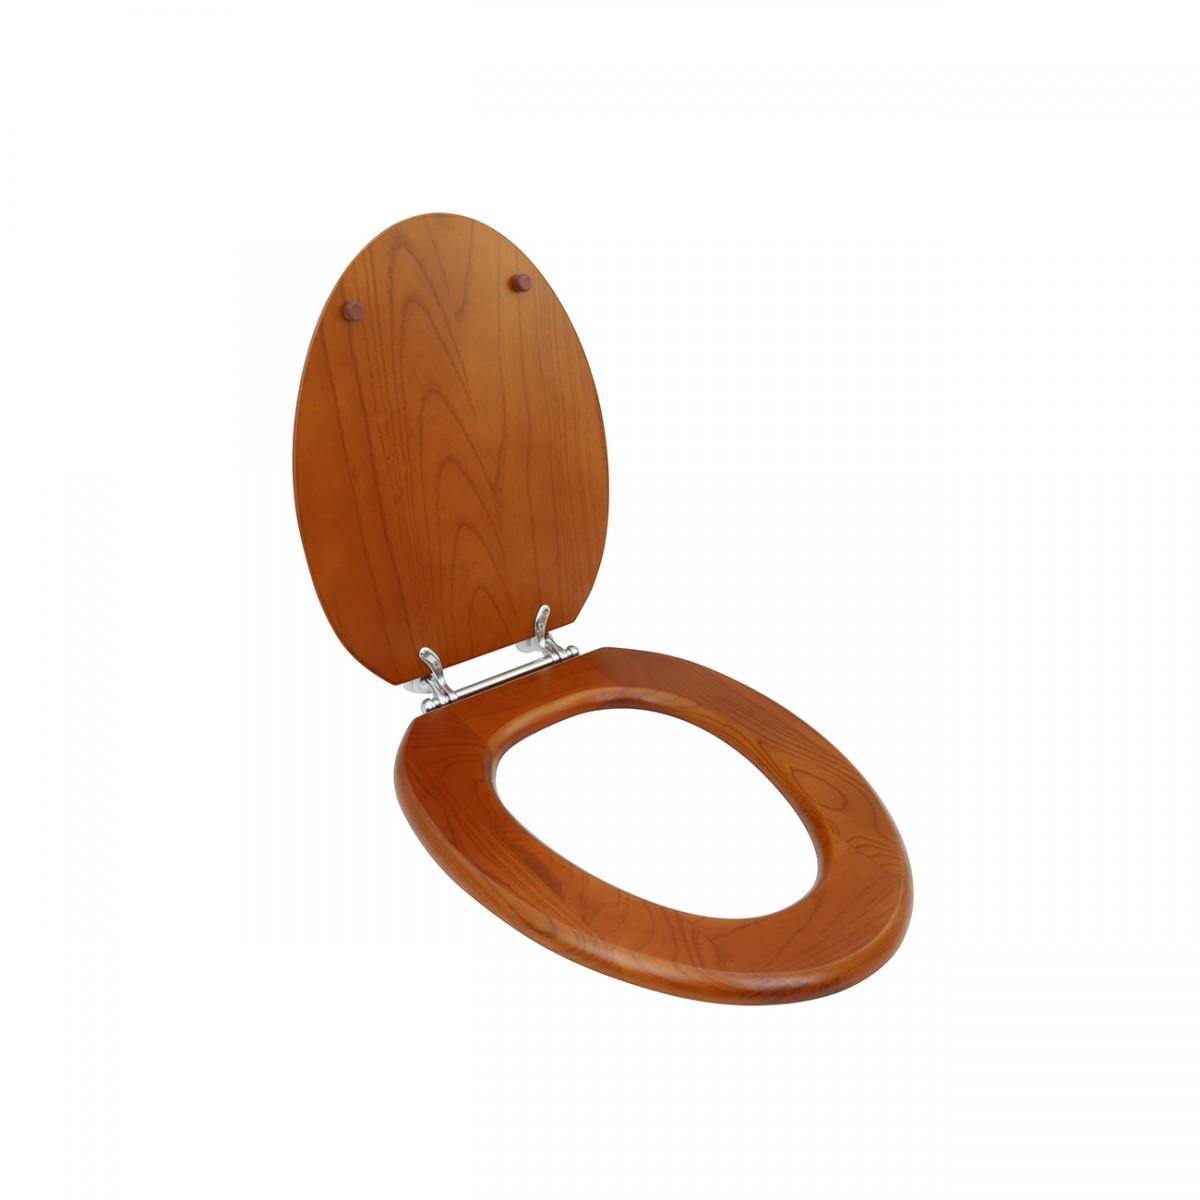 Toilet Seat Toilet Seats Hard Wood Toilet Seats